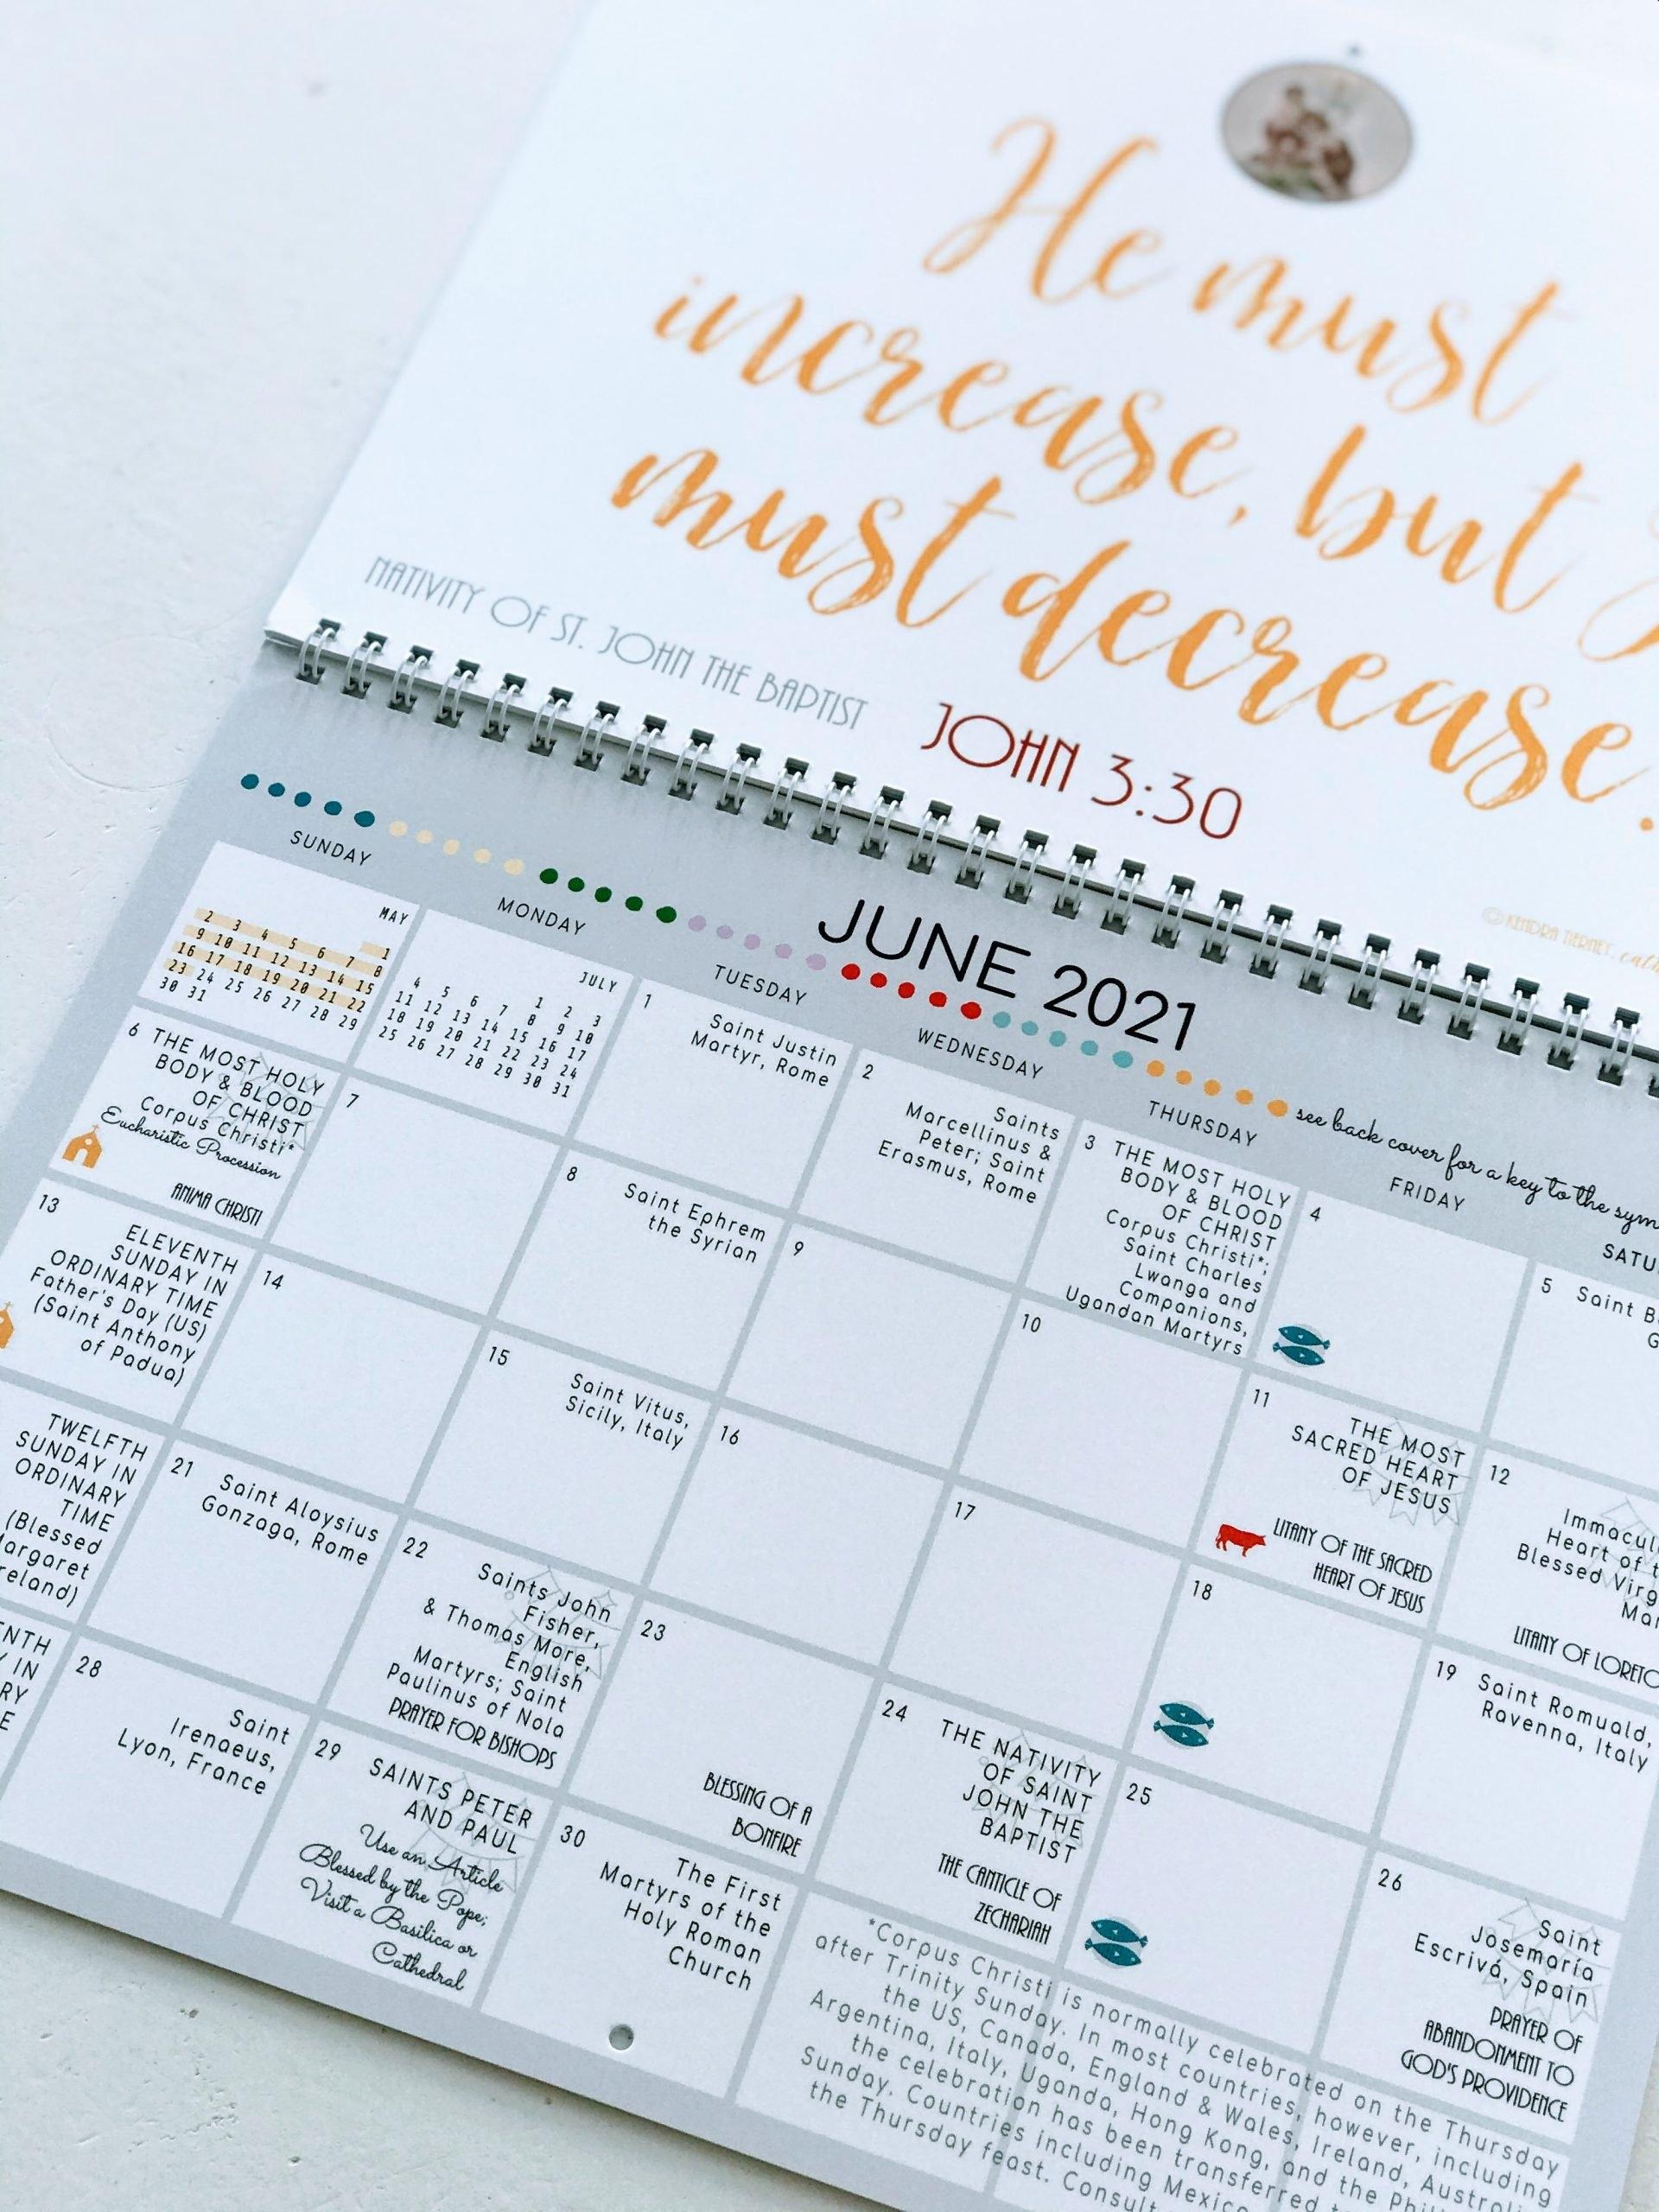 Free Printable Catholic Liturgical Calendar 2021 - 20+ Traditional Catholic Calendar 2021 - Free throughout Image Of 2021 Church Calendar